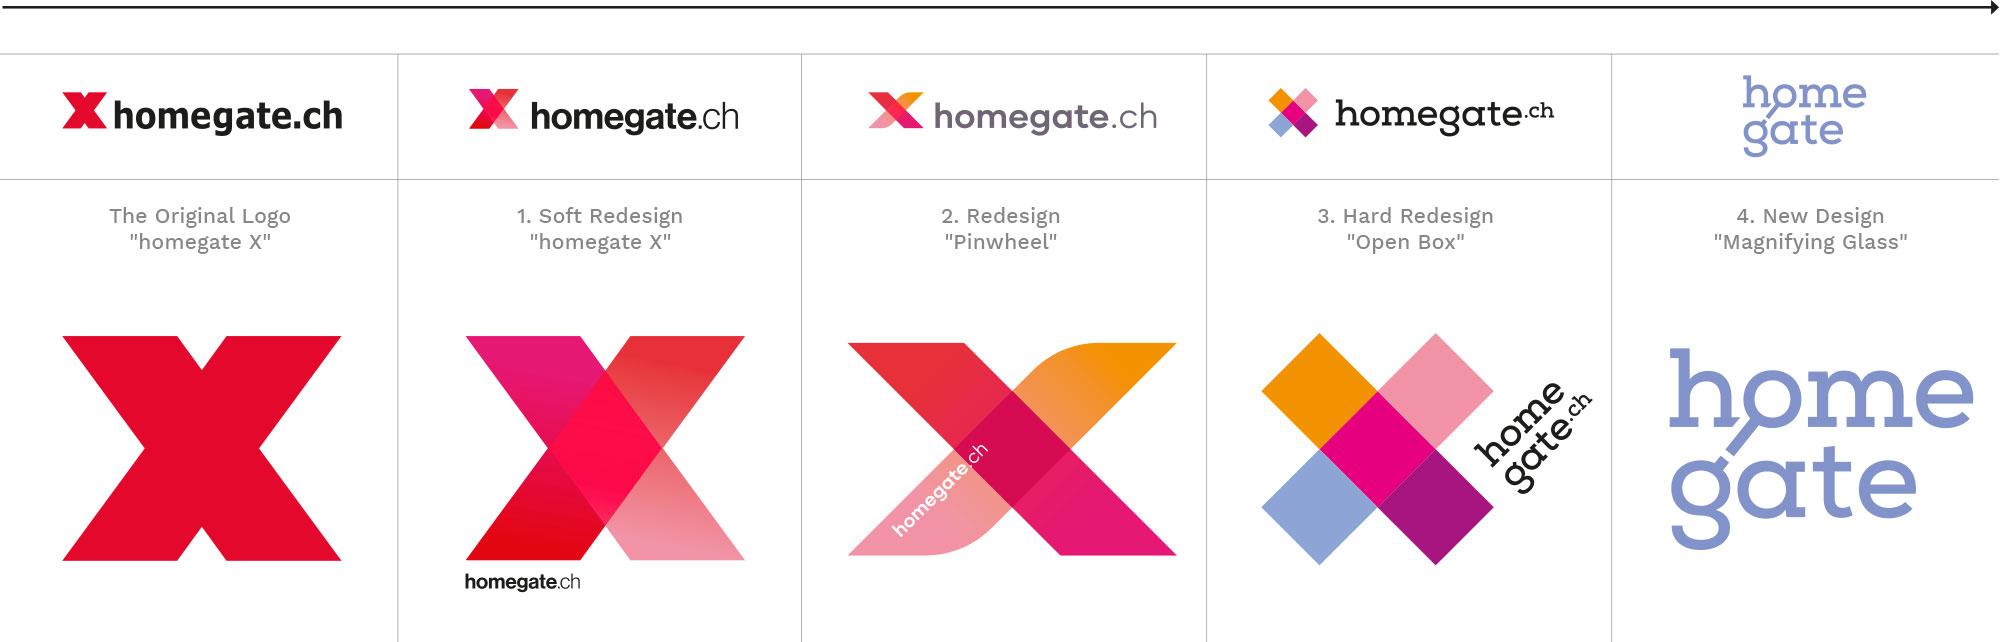 susanngreuel-homegate-corporatedesign-studie